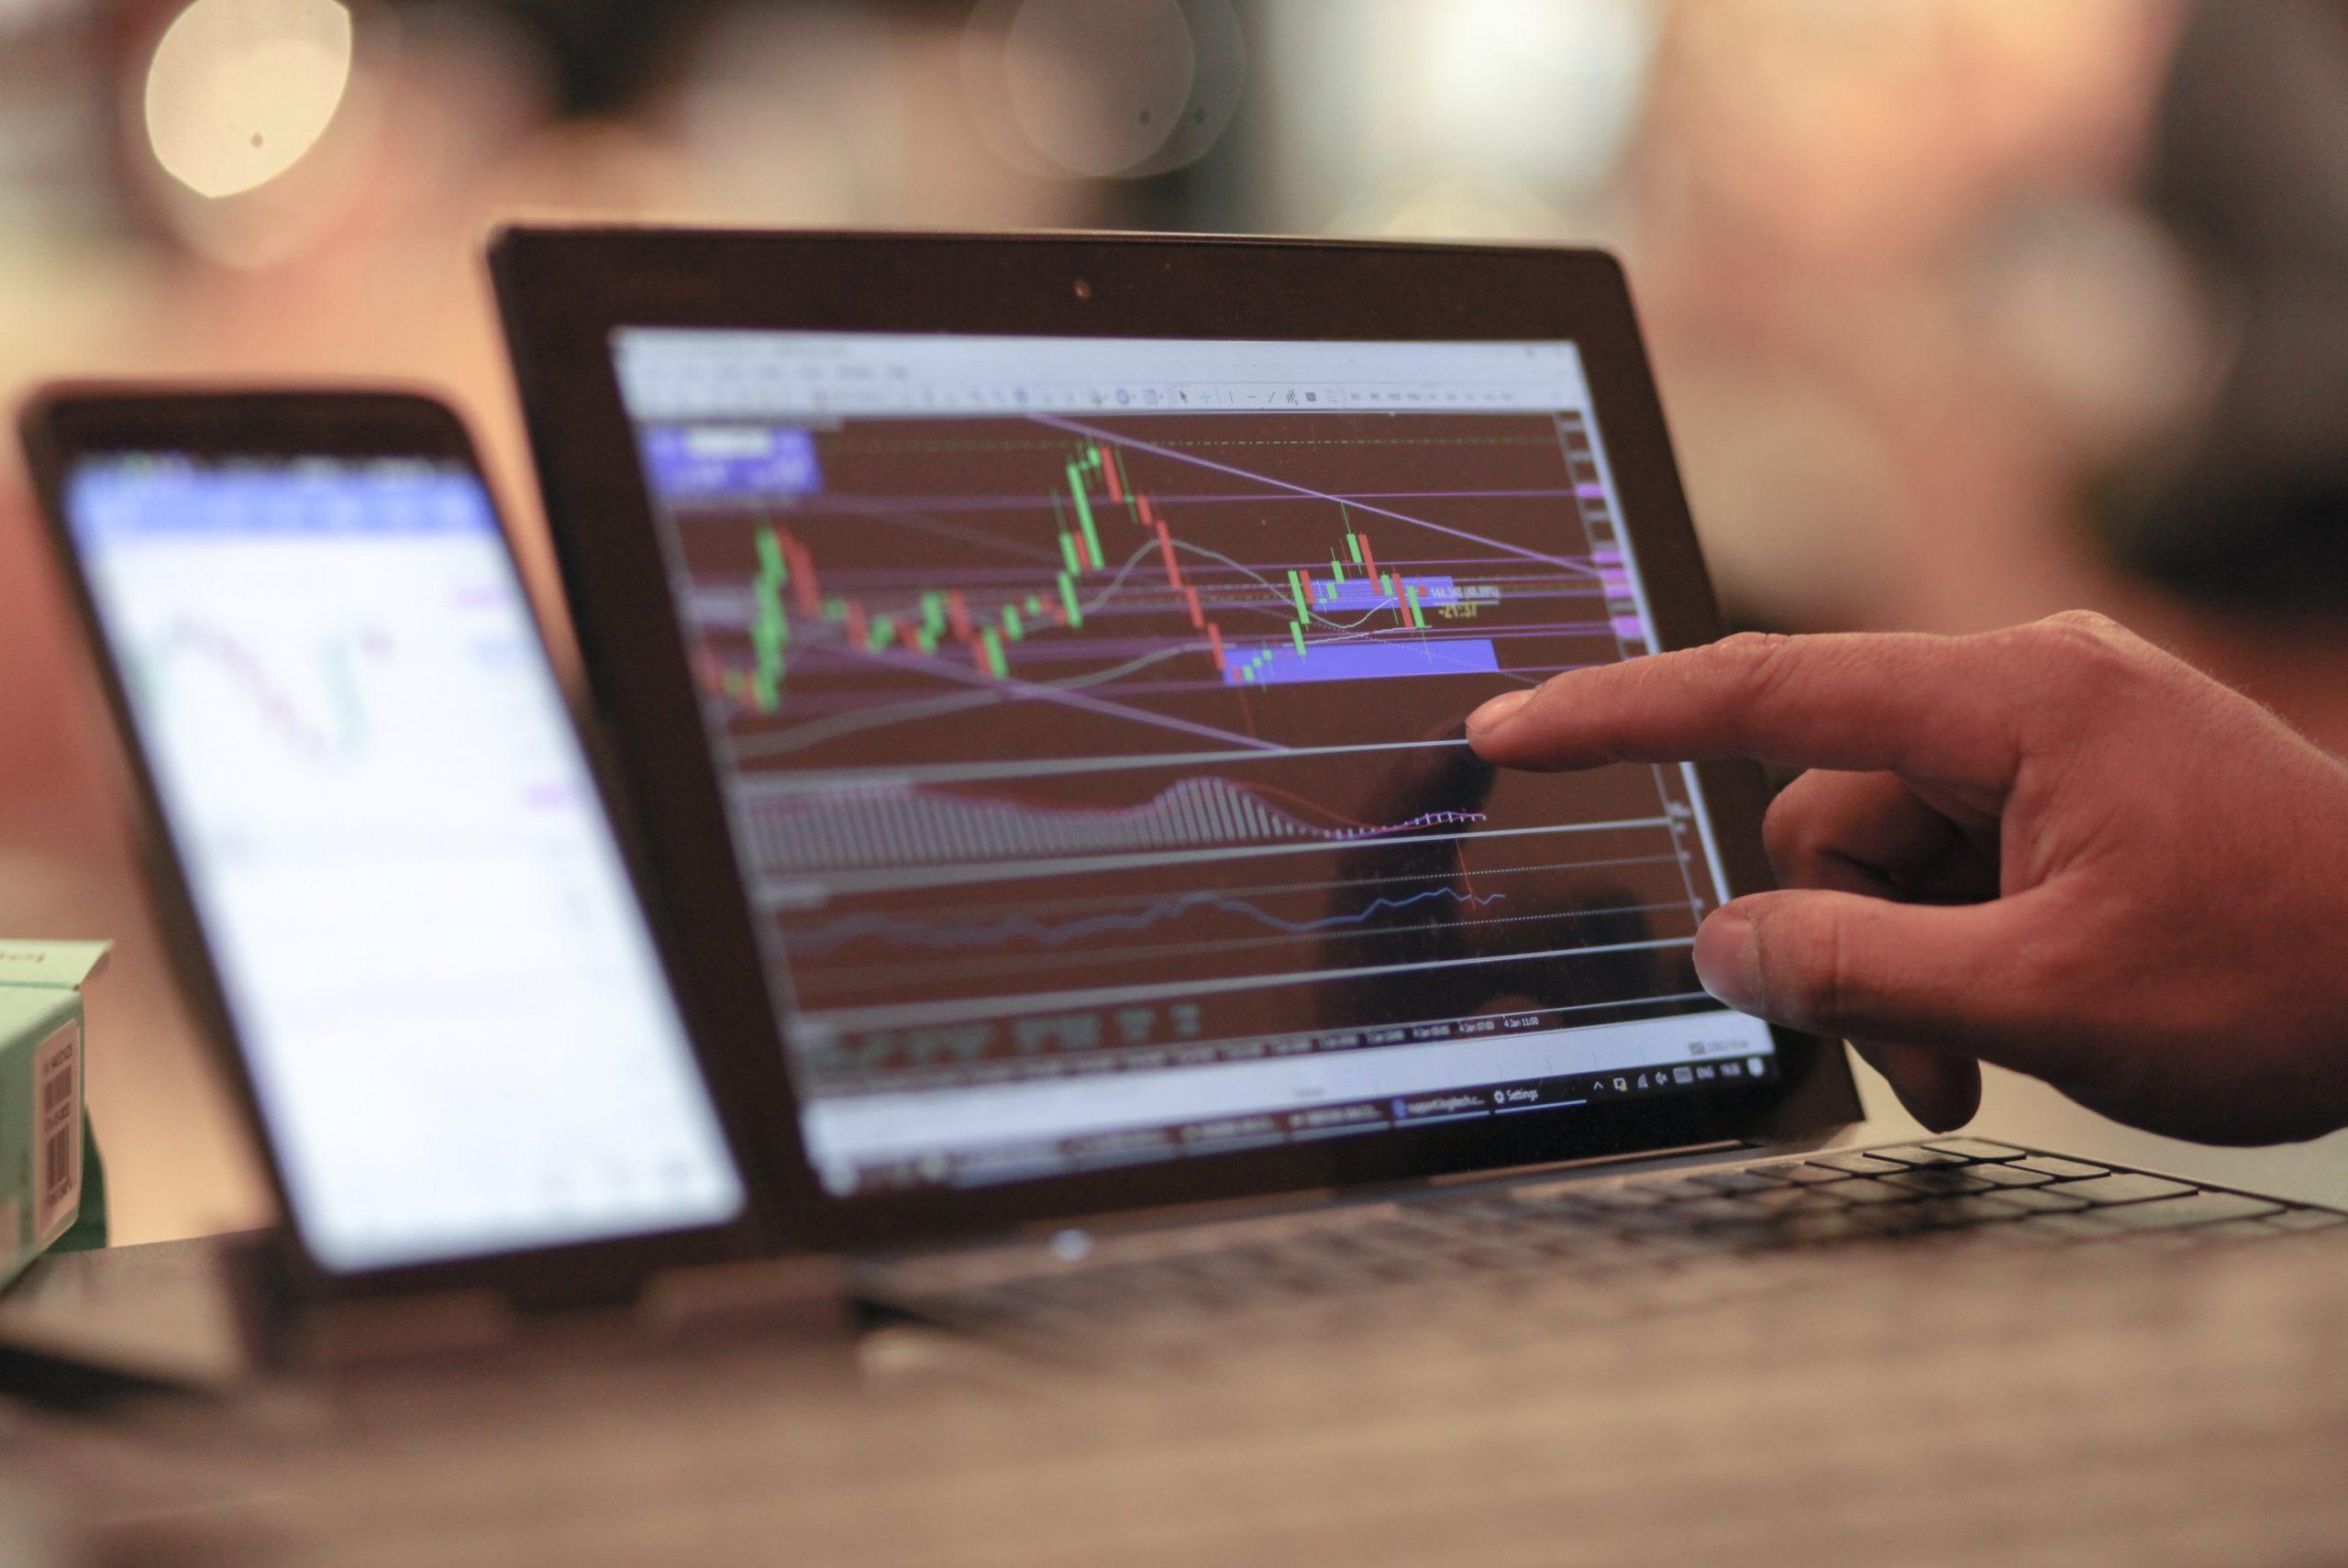 M1 Finance vs. TD Ameritrade – Which Online Stock Broker Is Best?